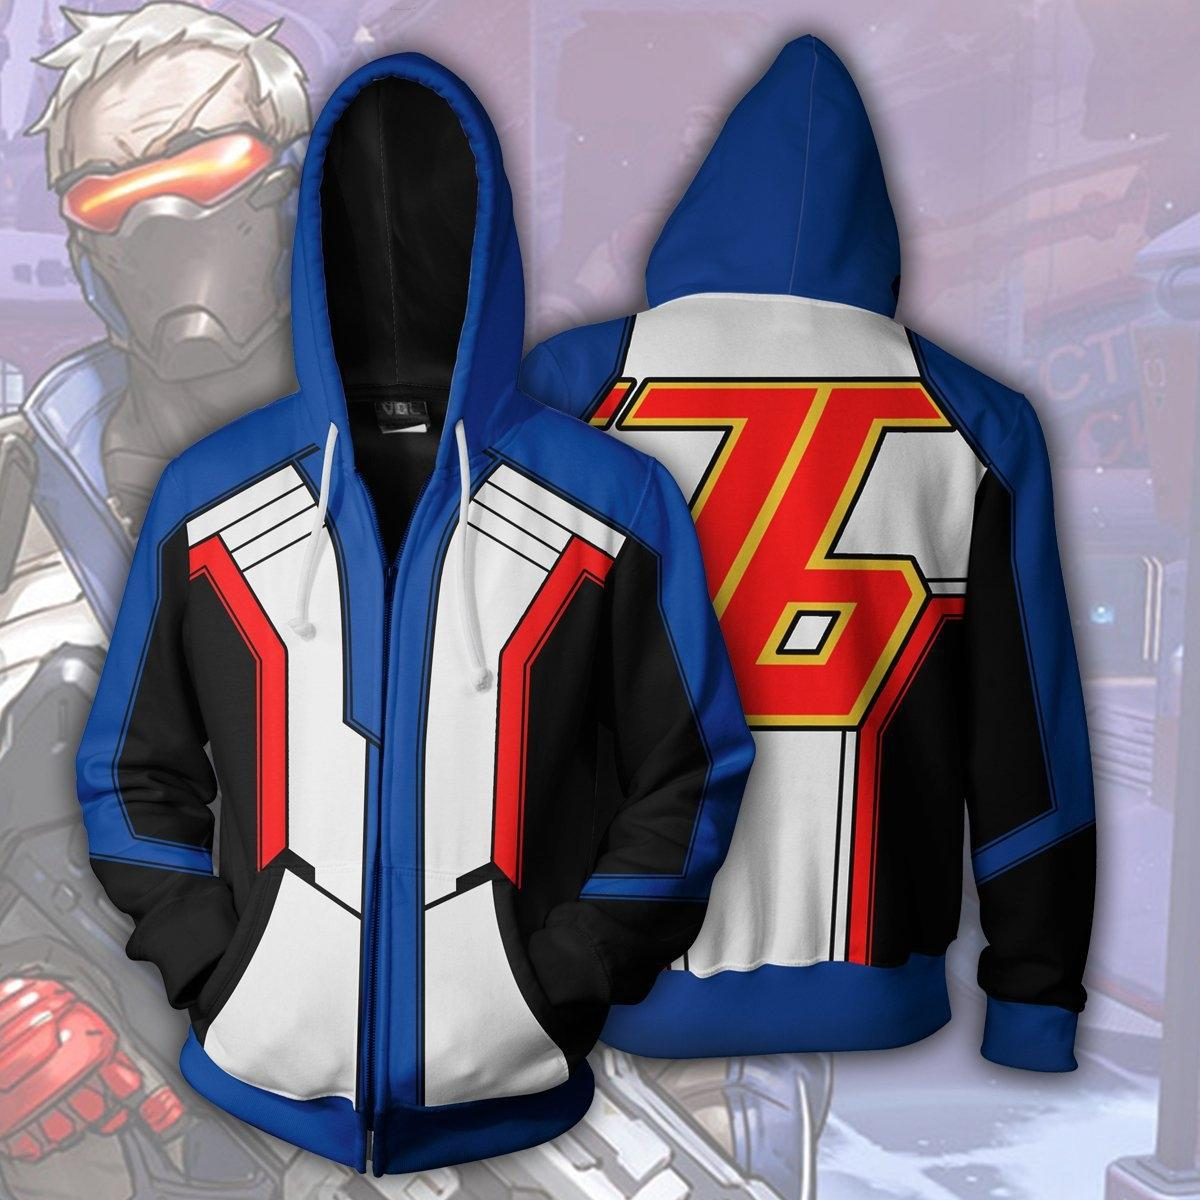 XueYN nuova serie di orologi pioniere Soldato 76 cardigan cosplay anime Nuovo orologio periferico serie hoodie pioniere Soldato 76 cardigan Cosplay h 8CBs7